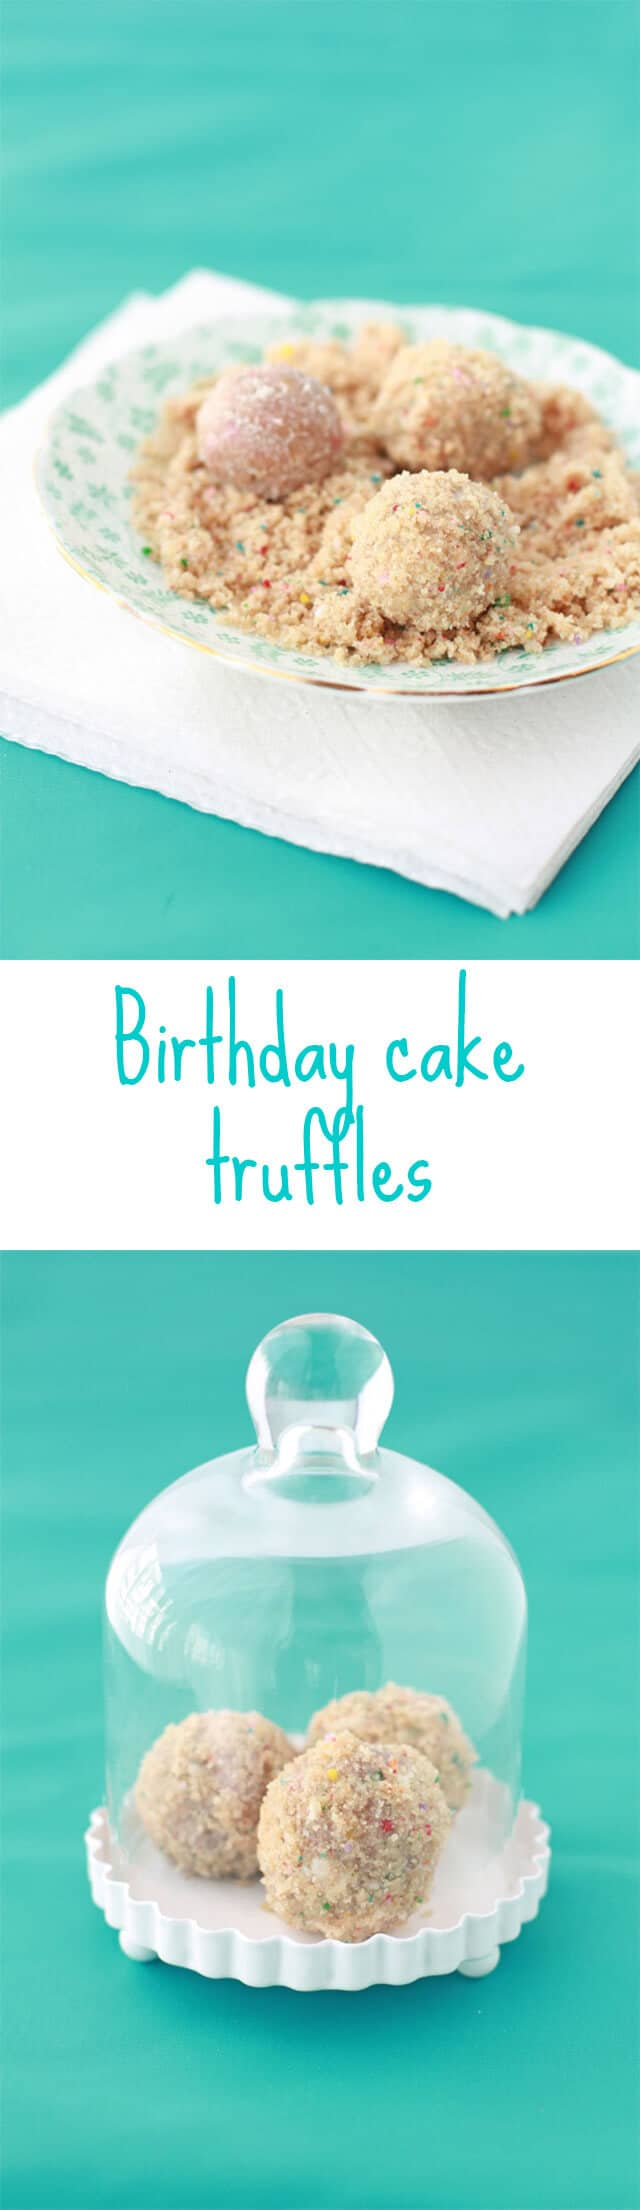 Momofuku Milk Bar birthday cake truffles recipe made from funfetti birthday cake straps and vanilla milk